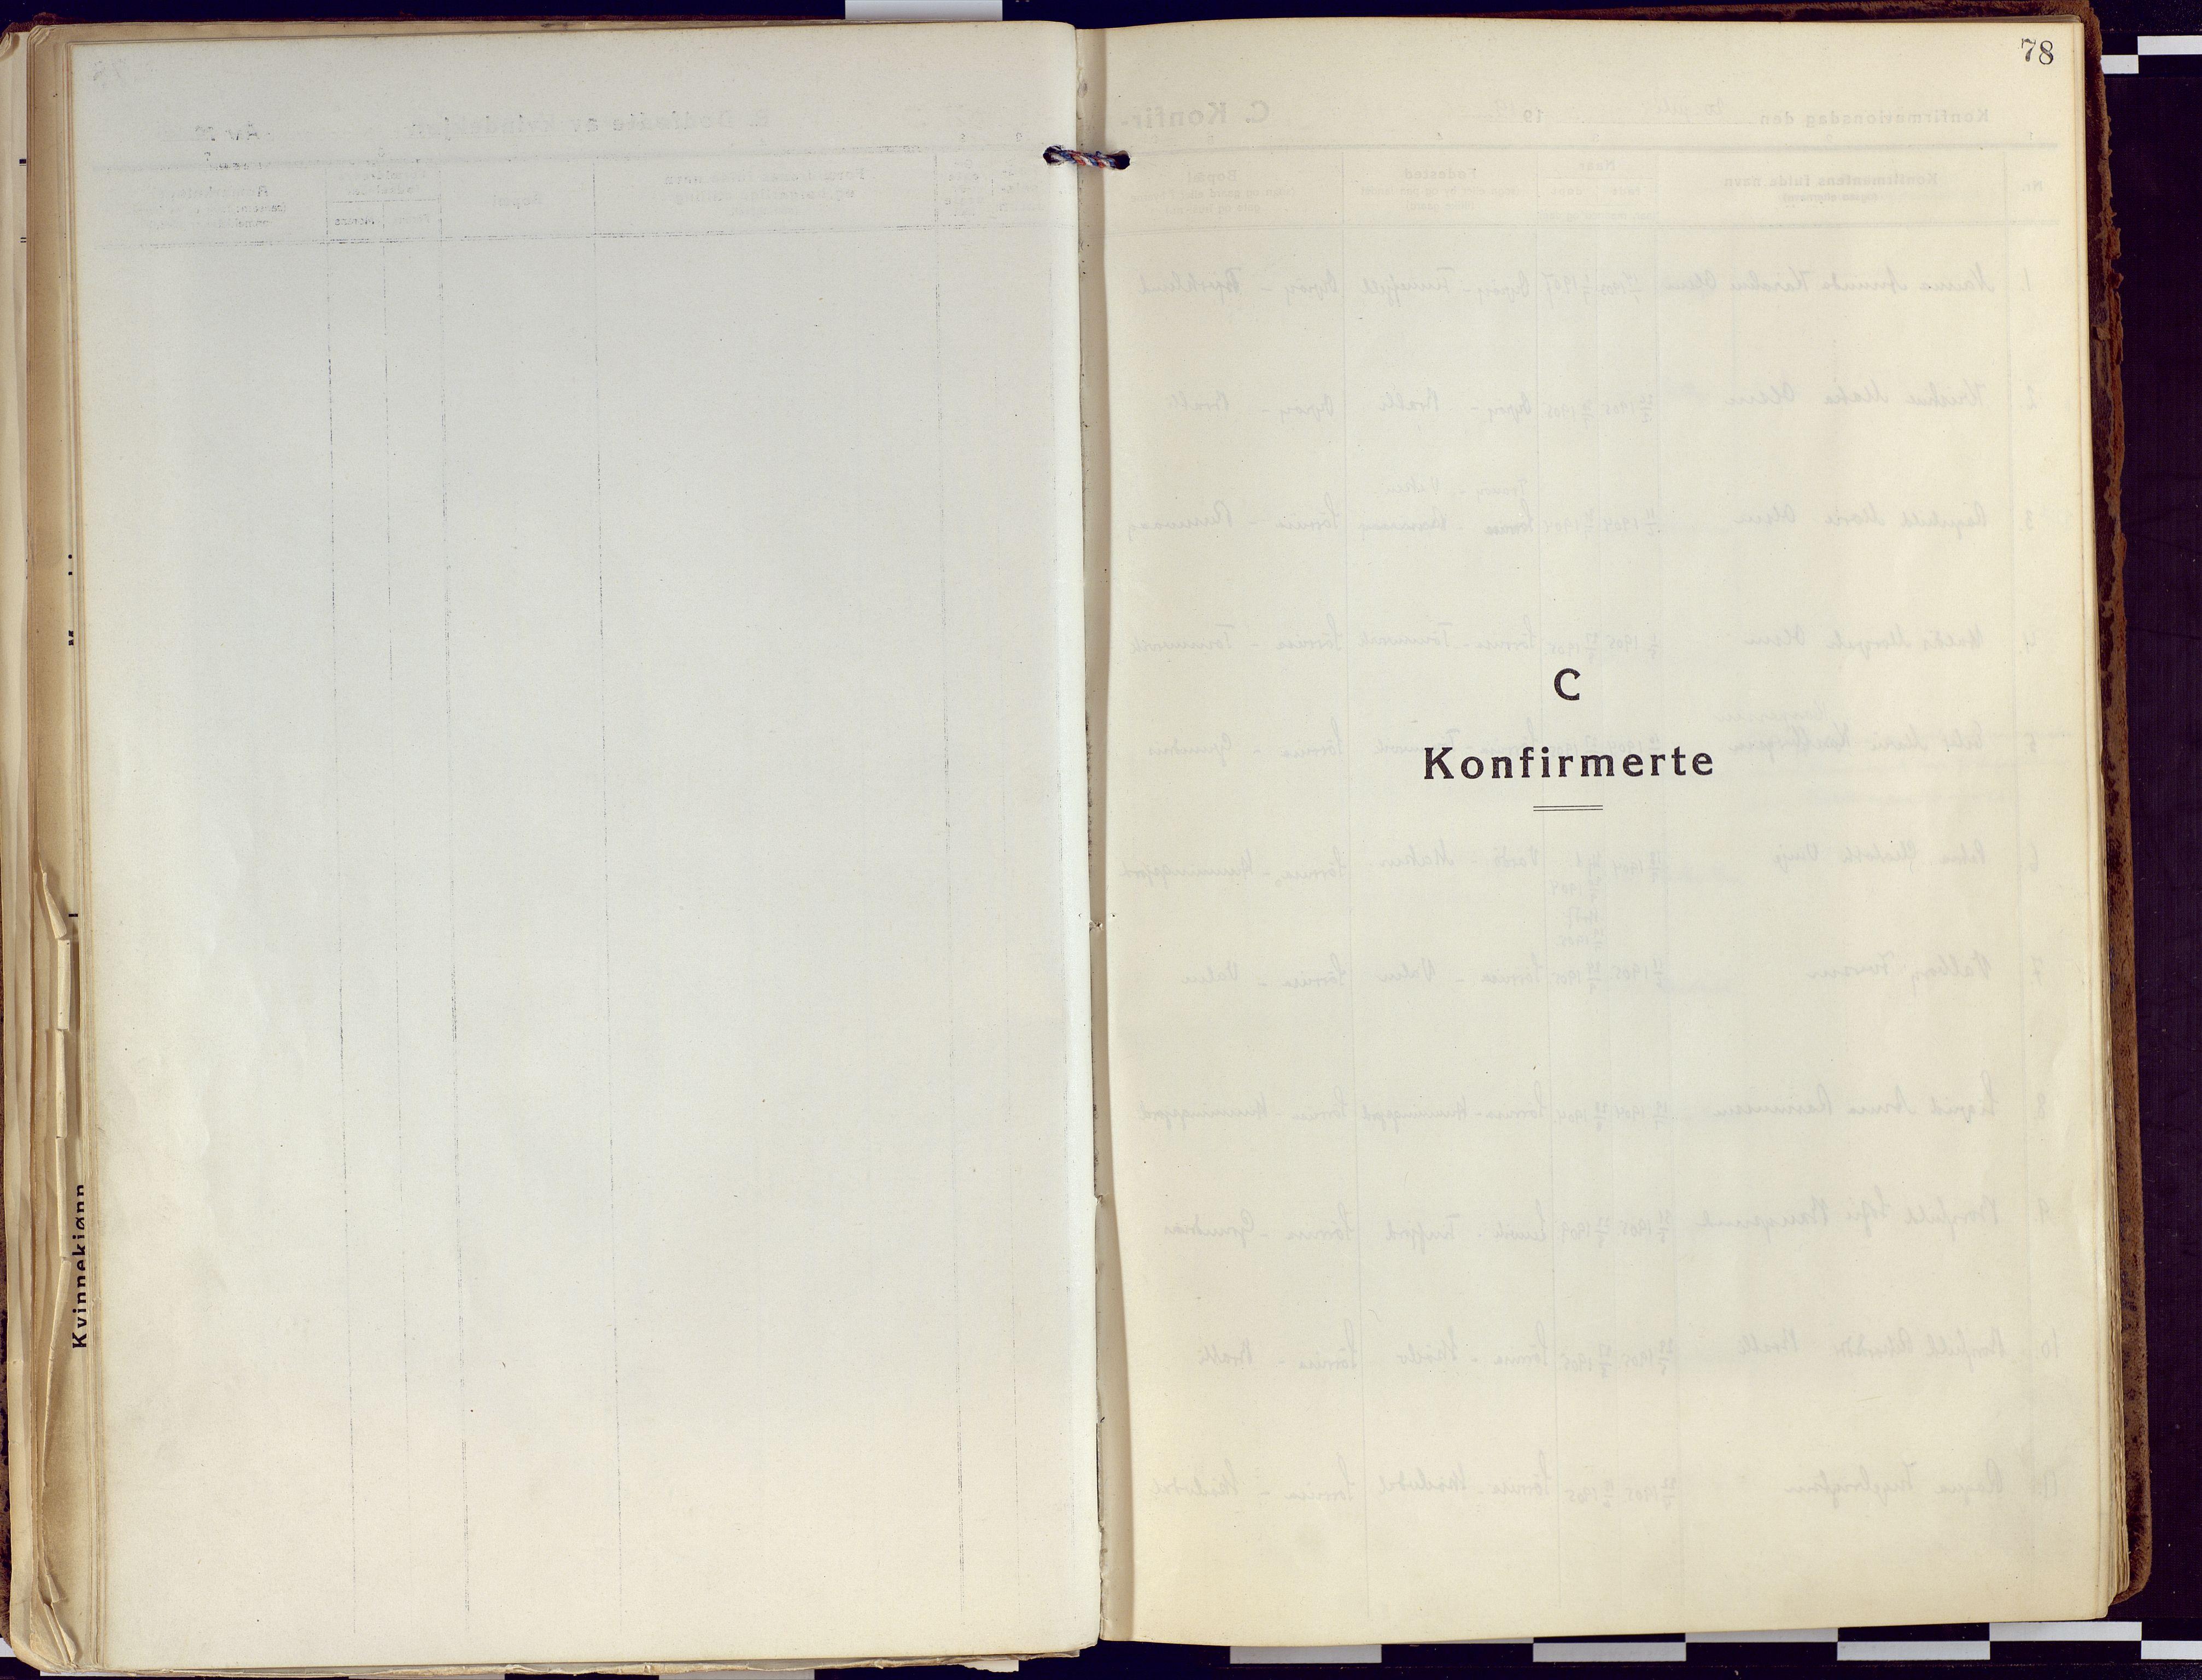 SATØ, Tranøy sokneprestkontor, I/Ia/Iaa/L0015kirke: Ministerialbok nr. 15, 1919-1928, s. 78